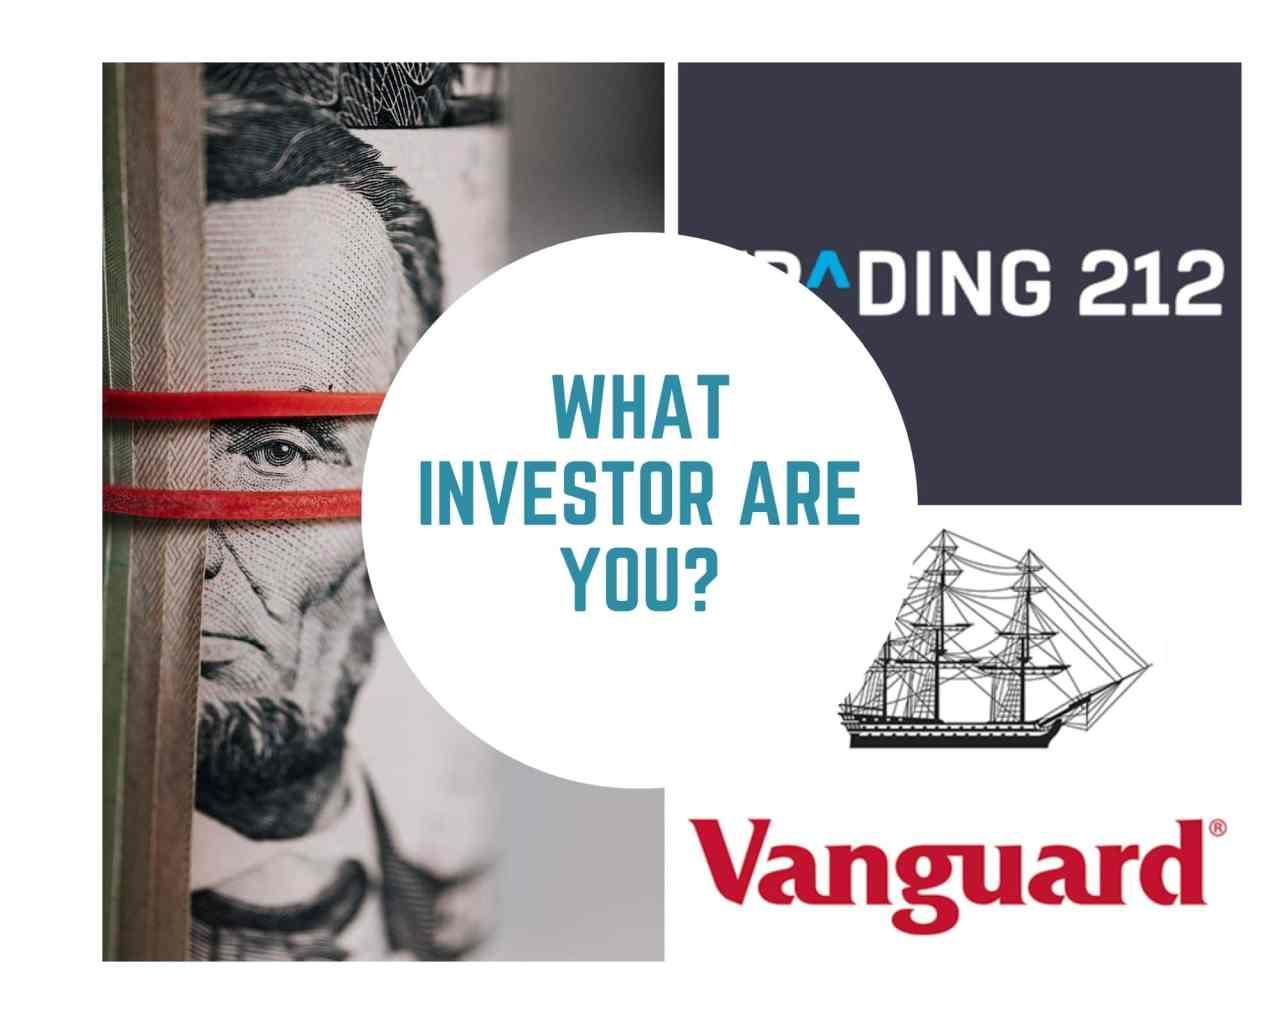 Trading 212 or Vanguard?